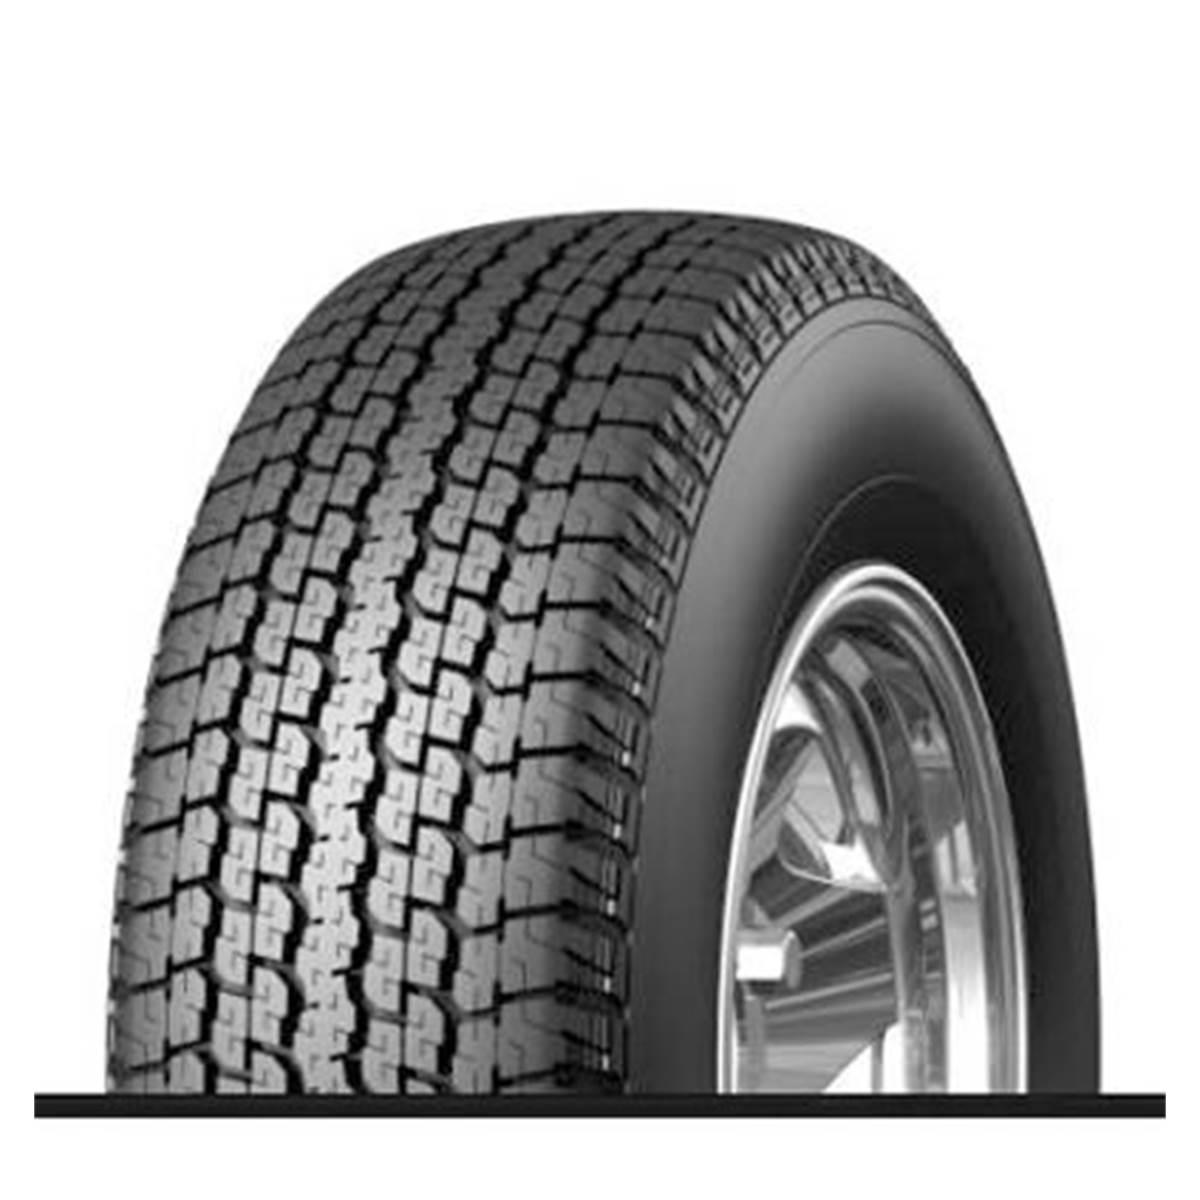 Pneu Bridgestone 265/65X17 110 S DUELER D840